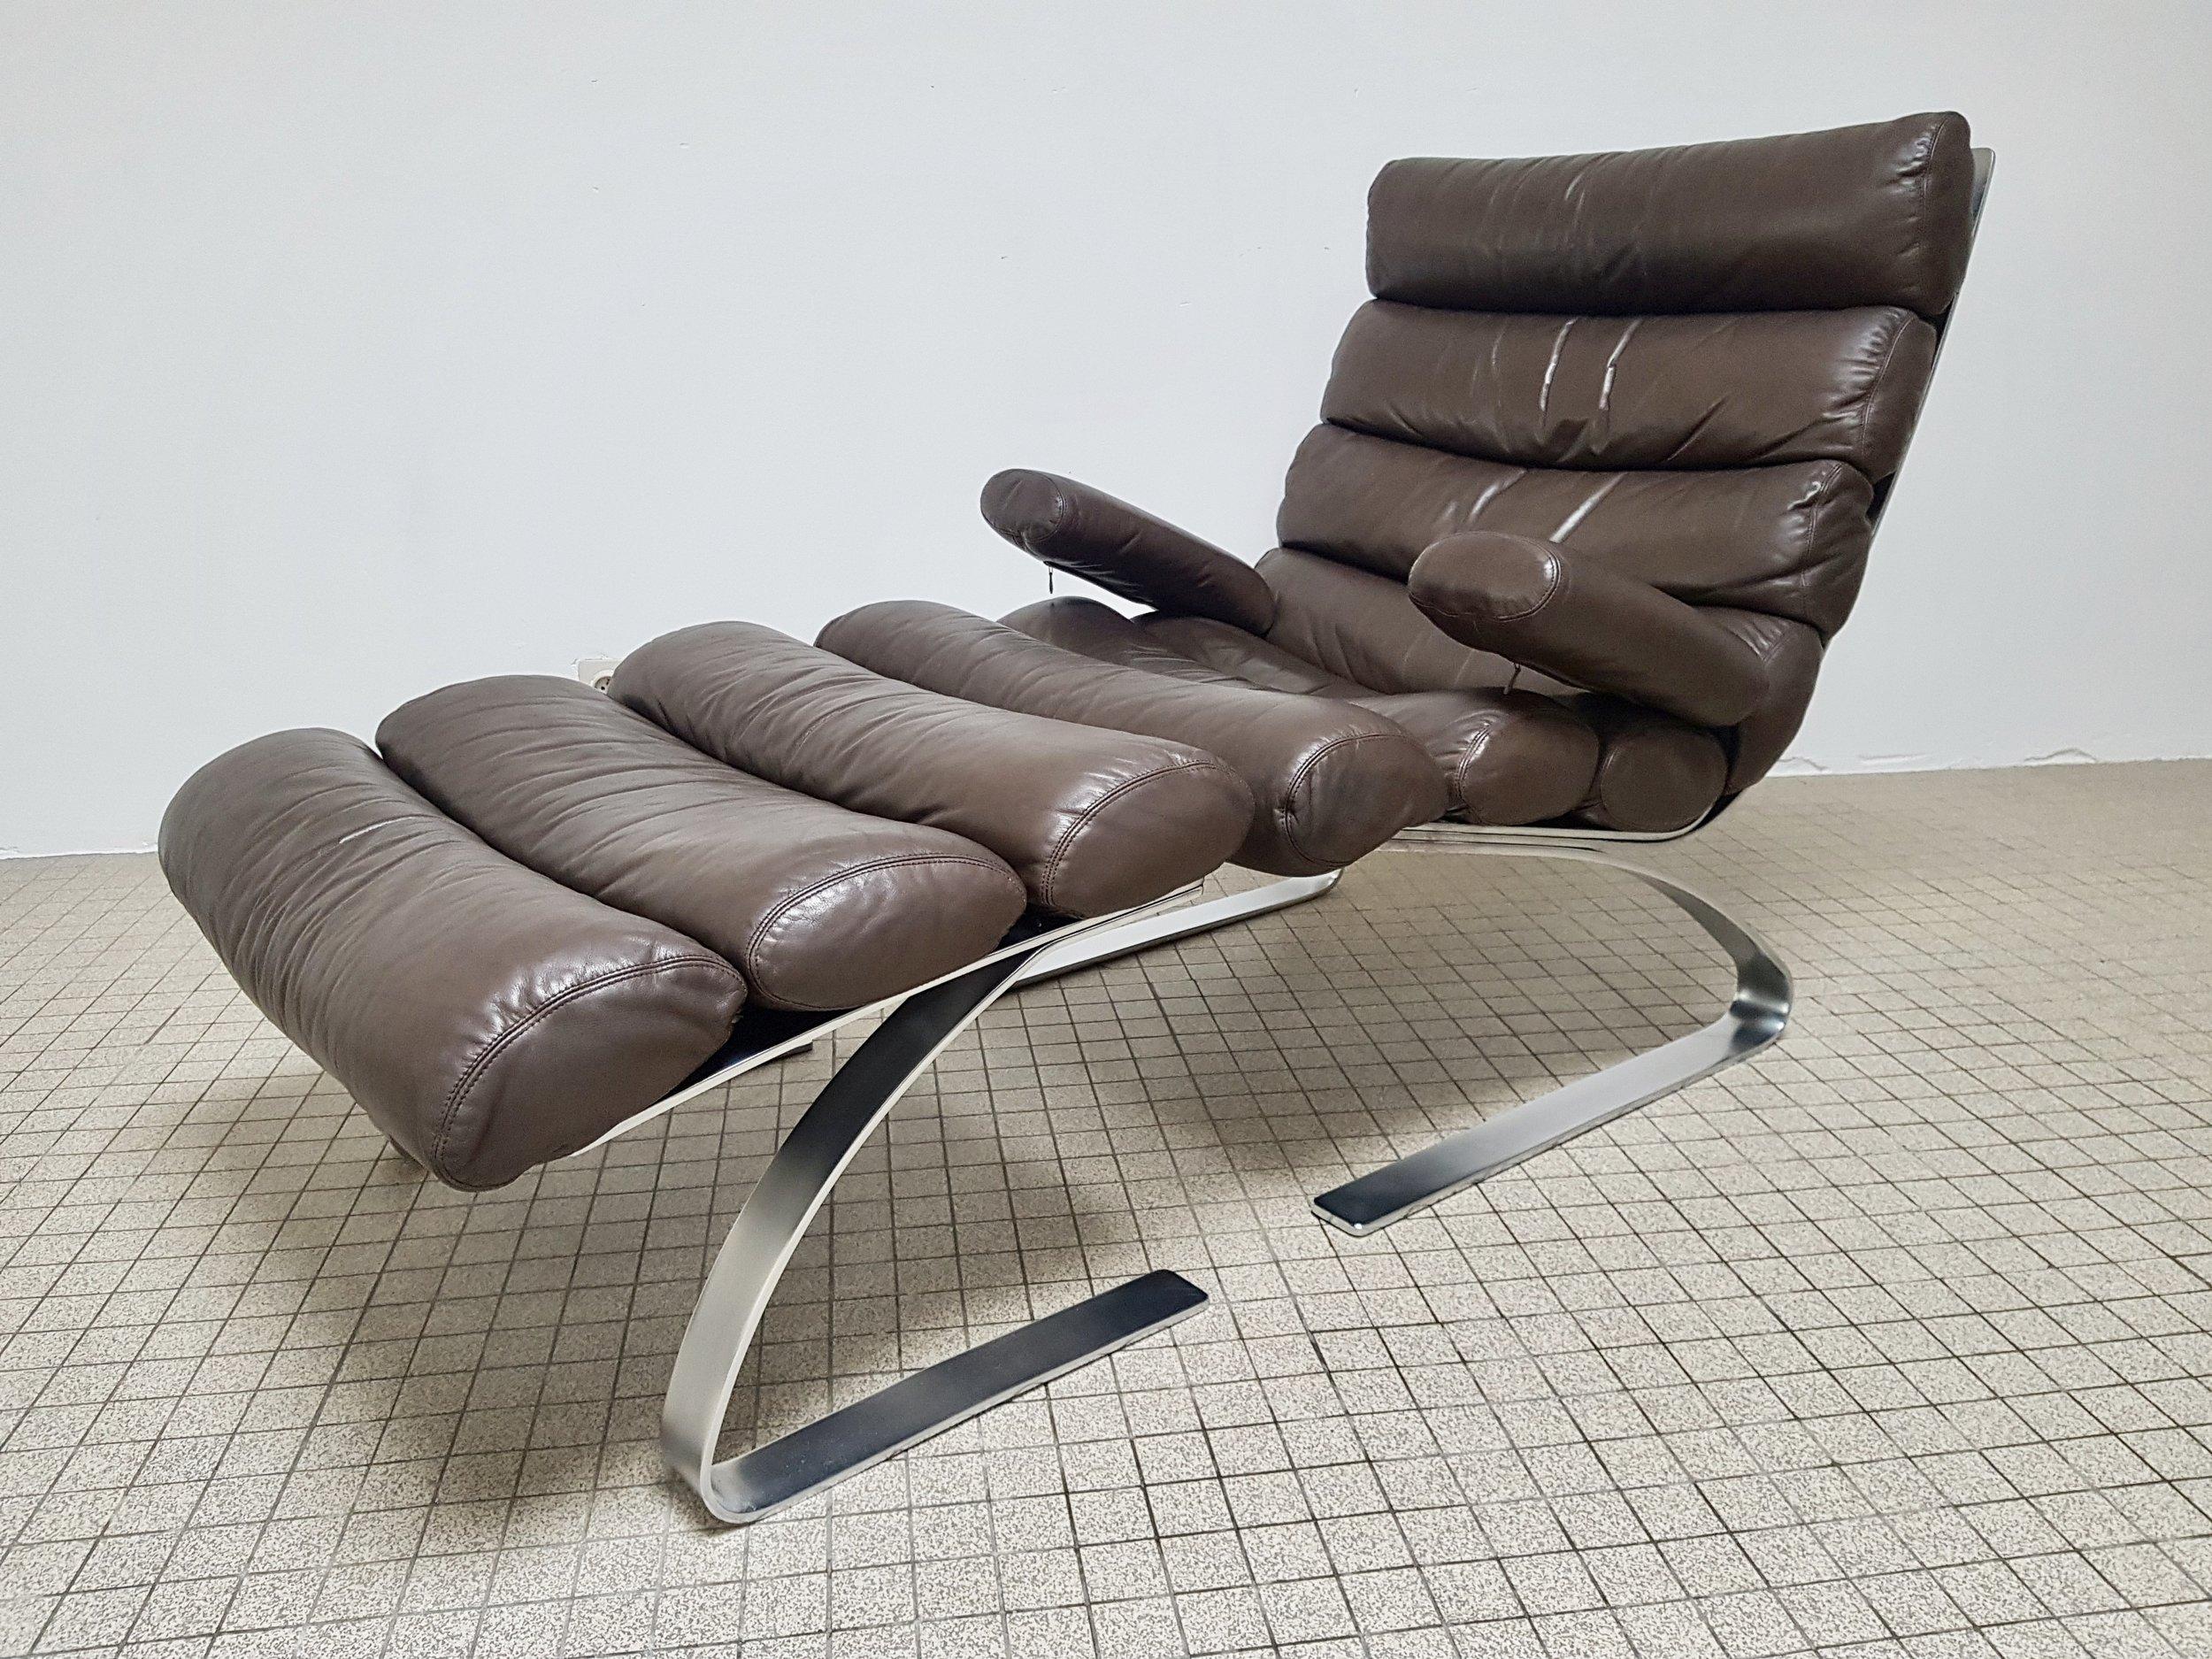 Fantastic Sold Cor Sinus Lounge Chair Ottoman Vintage Design Ibusinesslaw Wood Chair Design Ideas Ibusinesslaworg